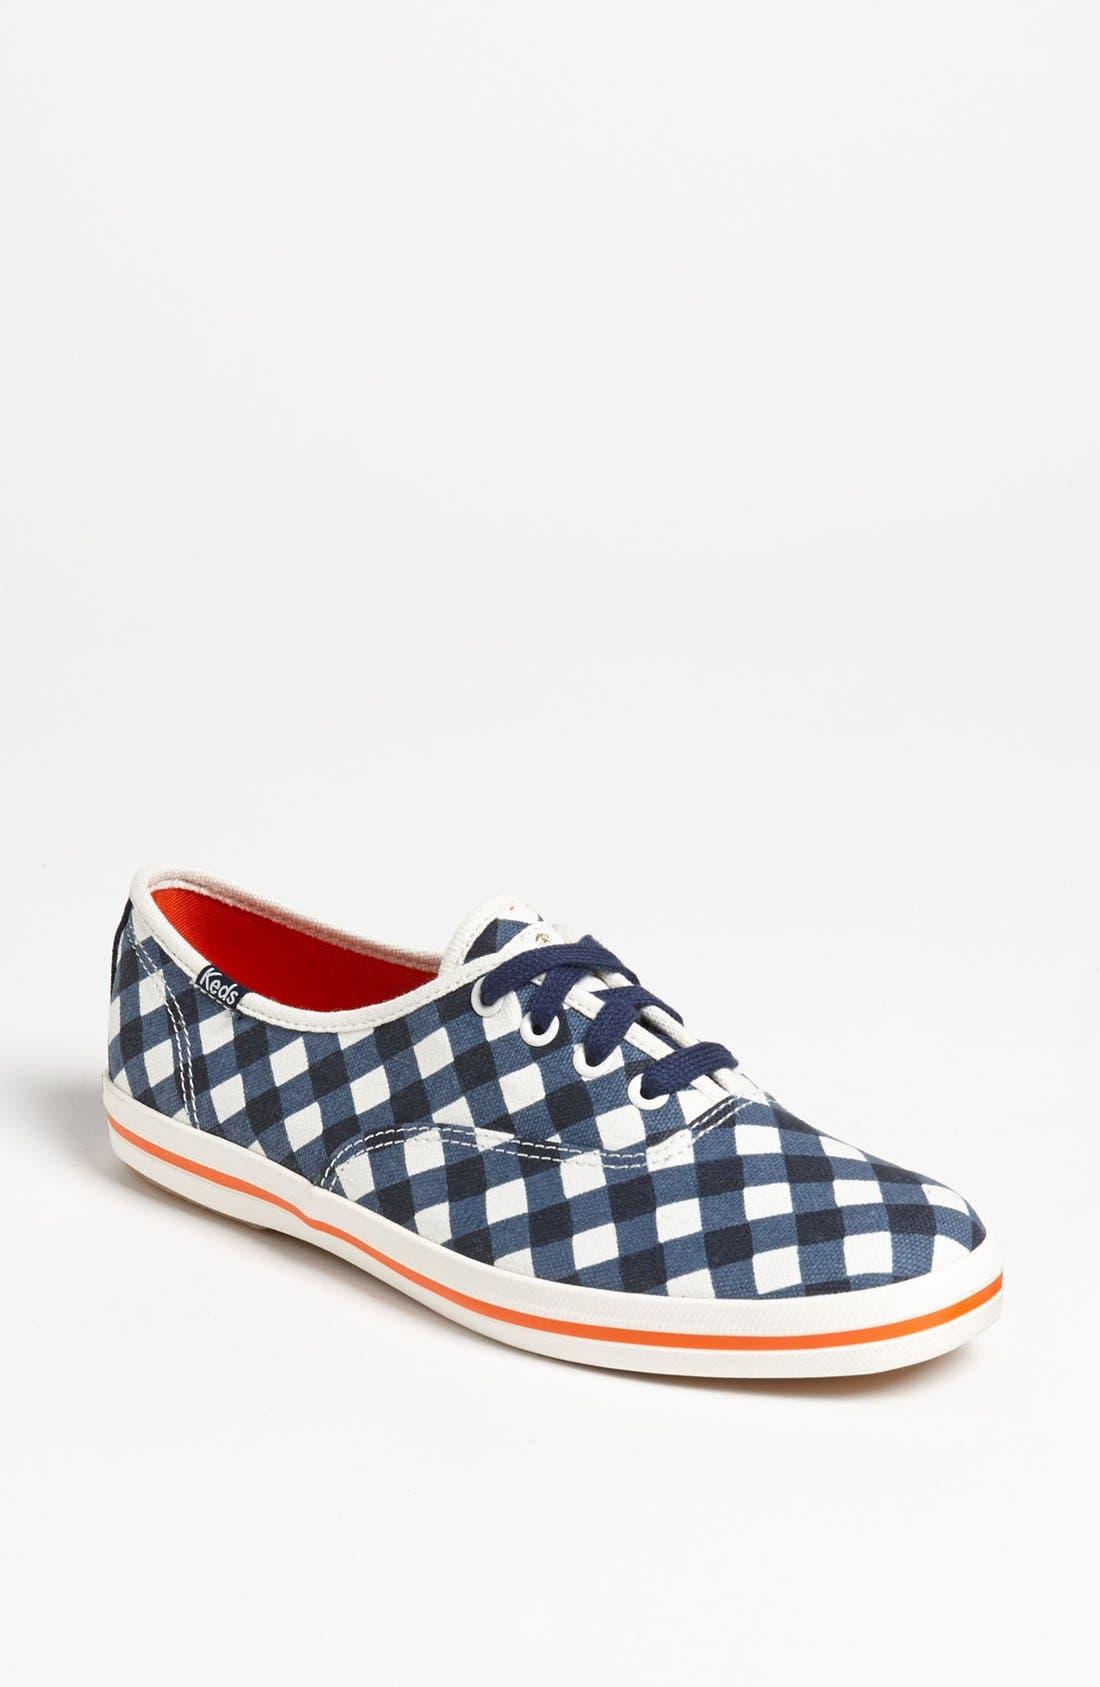 Keds<sup>®</sup> for kate spade new york 'kick' sneaker,                             Main thumbnail 2, color,